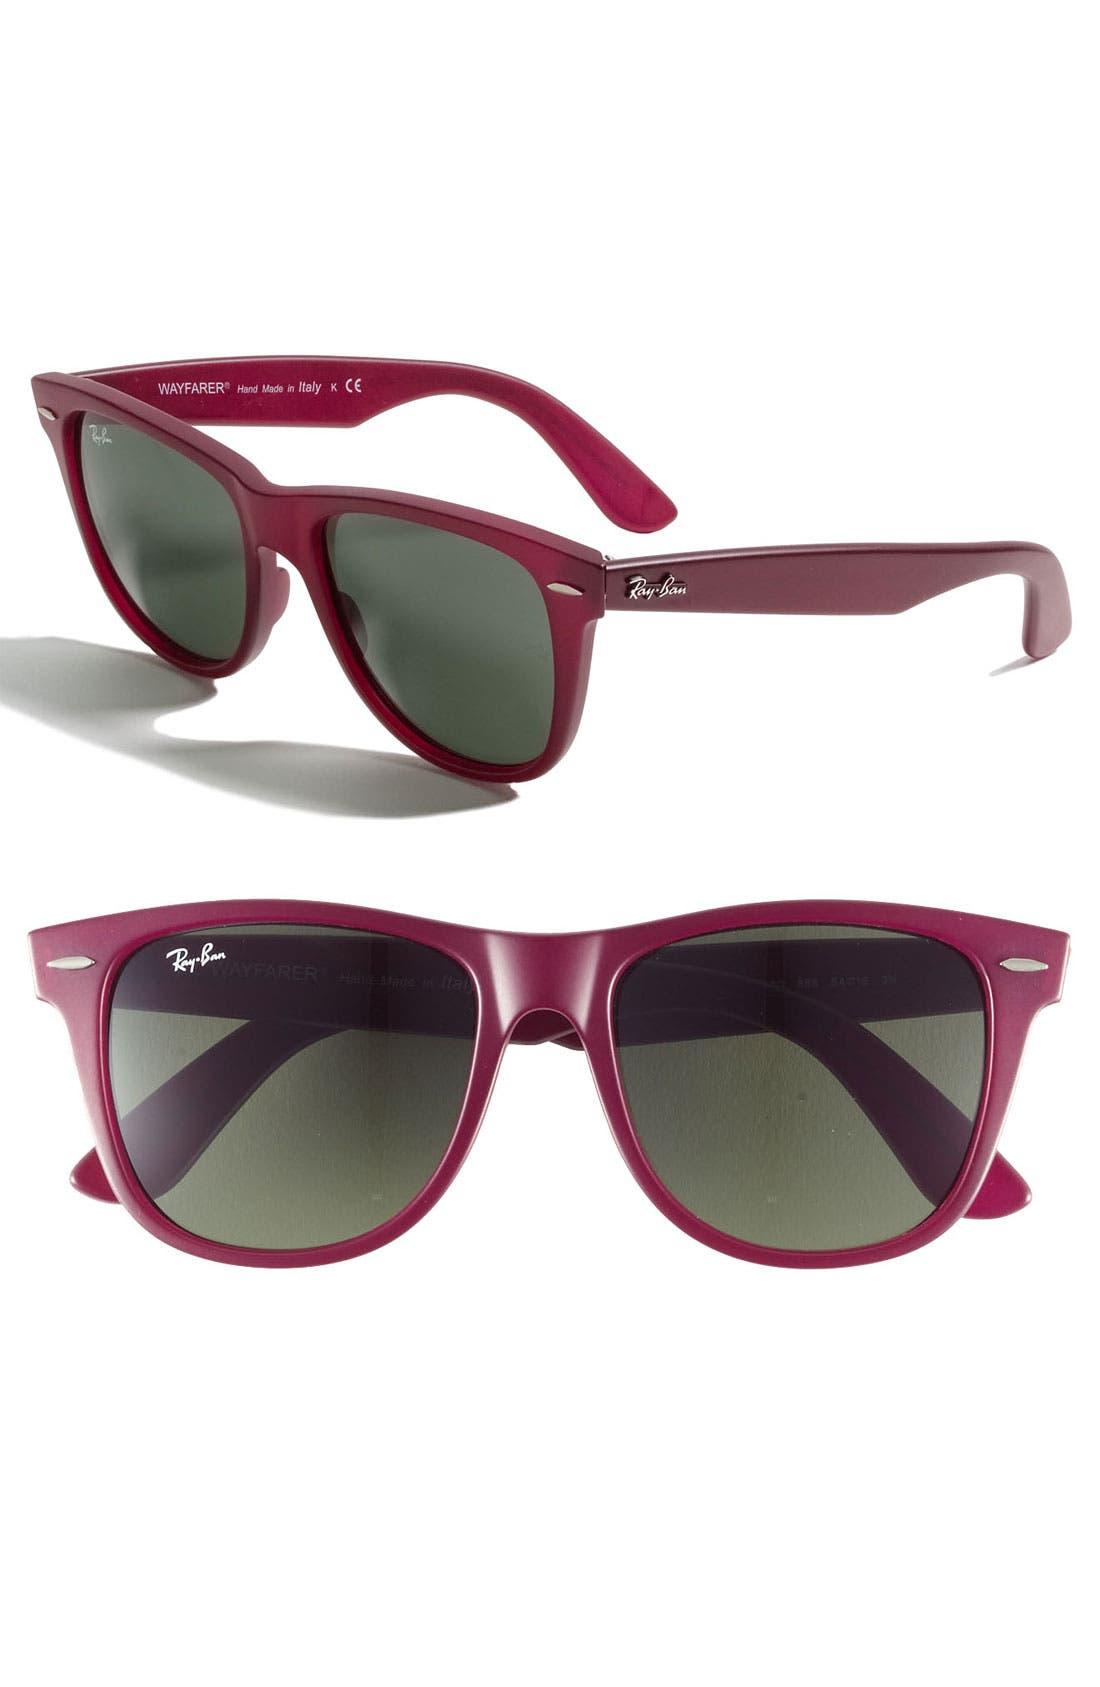 Large Classic Wayfarer 54mm Sunglasses,                         Main,                         color, Matte Red/ Green